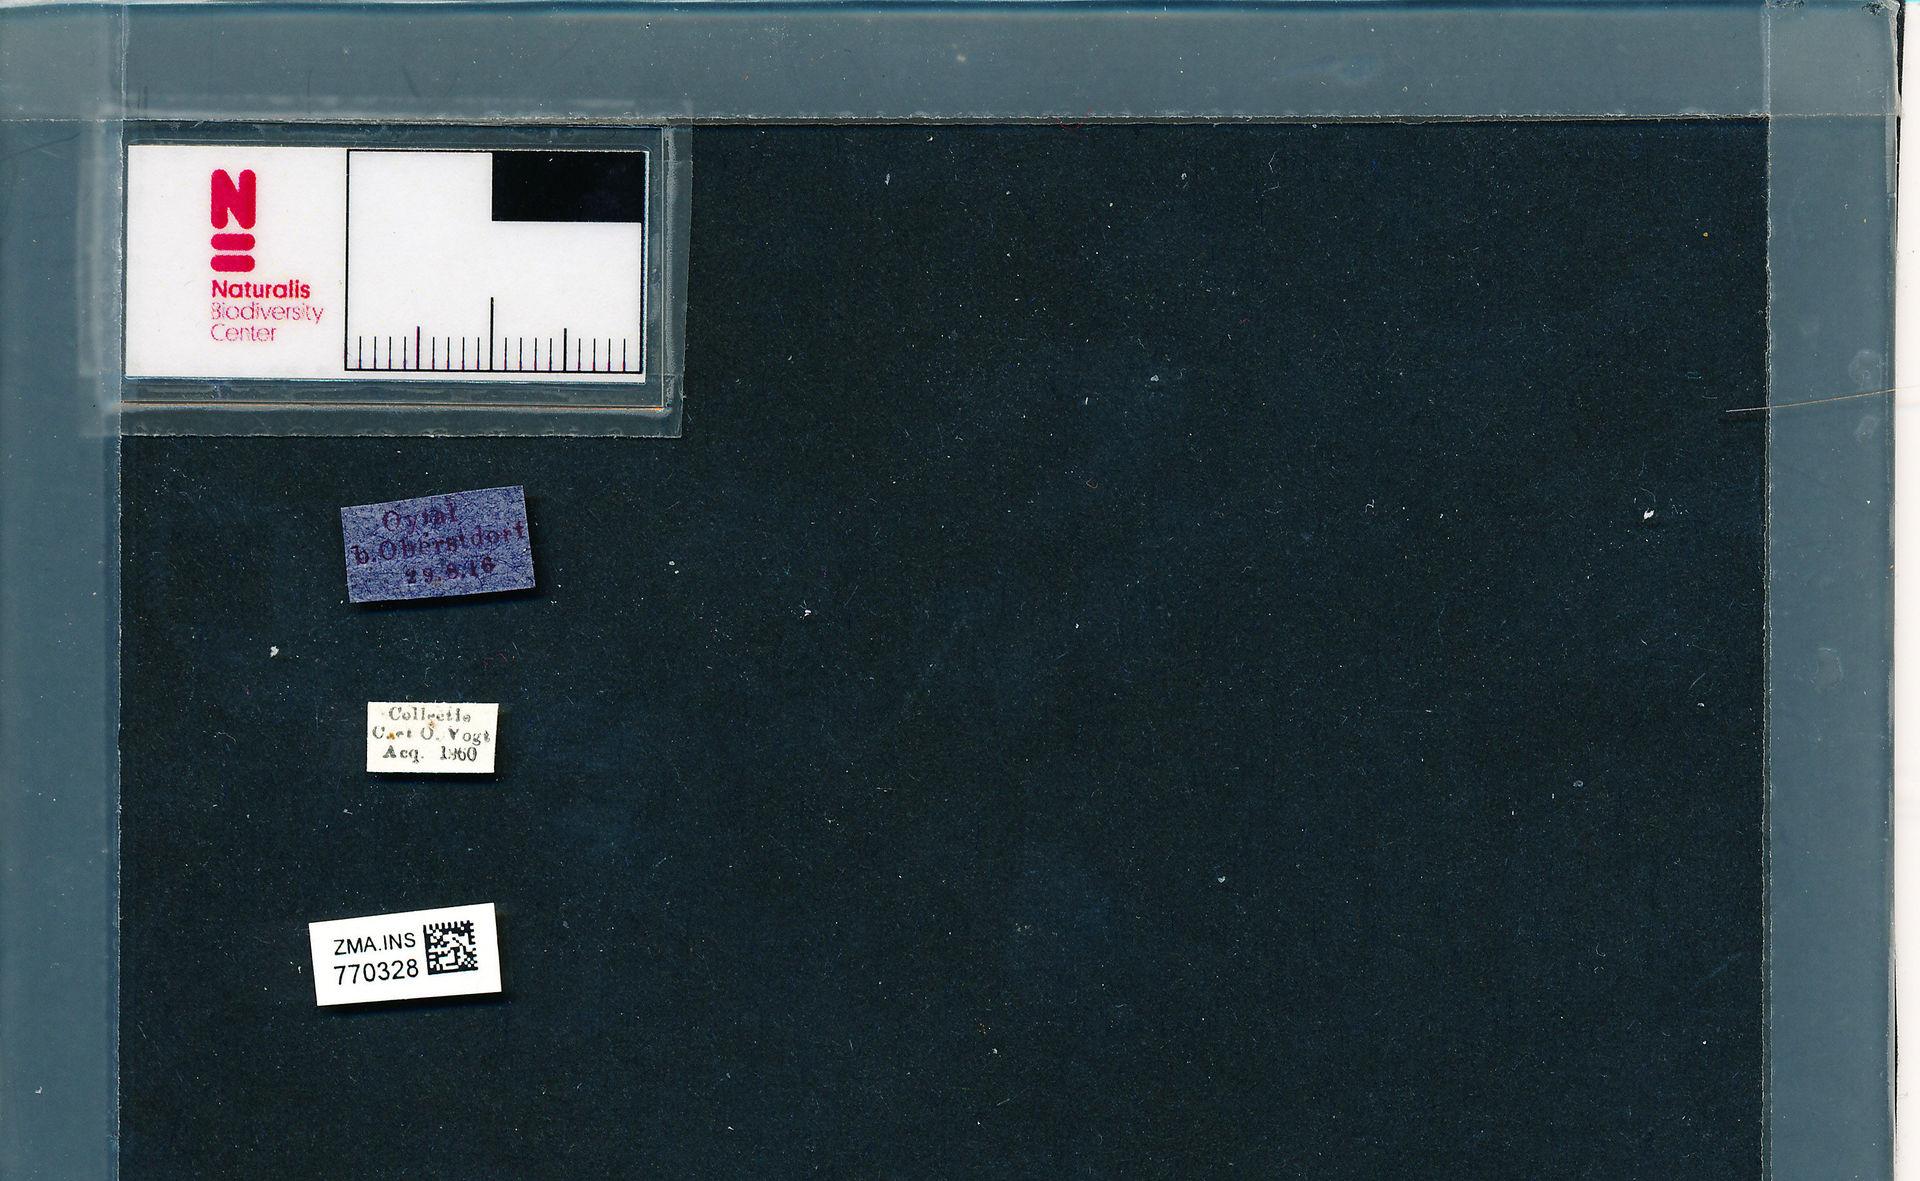 ZMA.INS.770328 | Bombus (Pyrobombus) pratorum pratorum (Linnaeus, 1761)